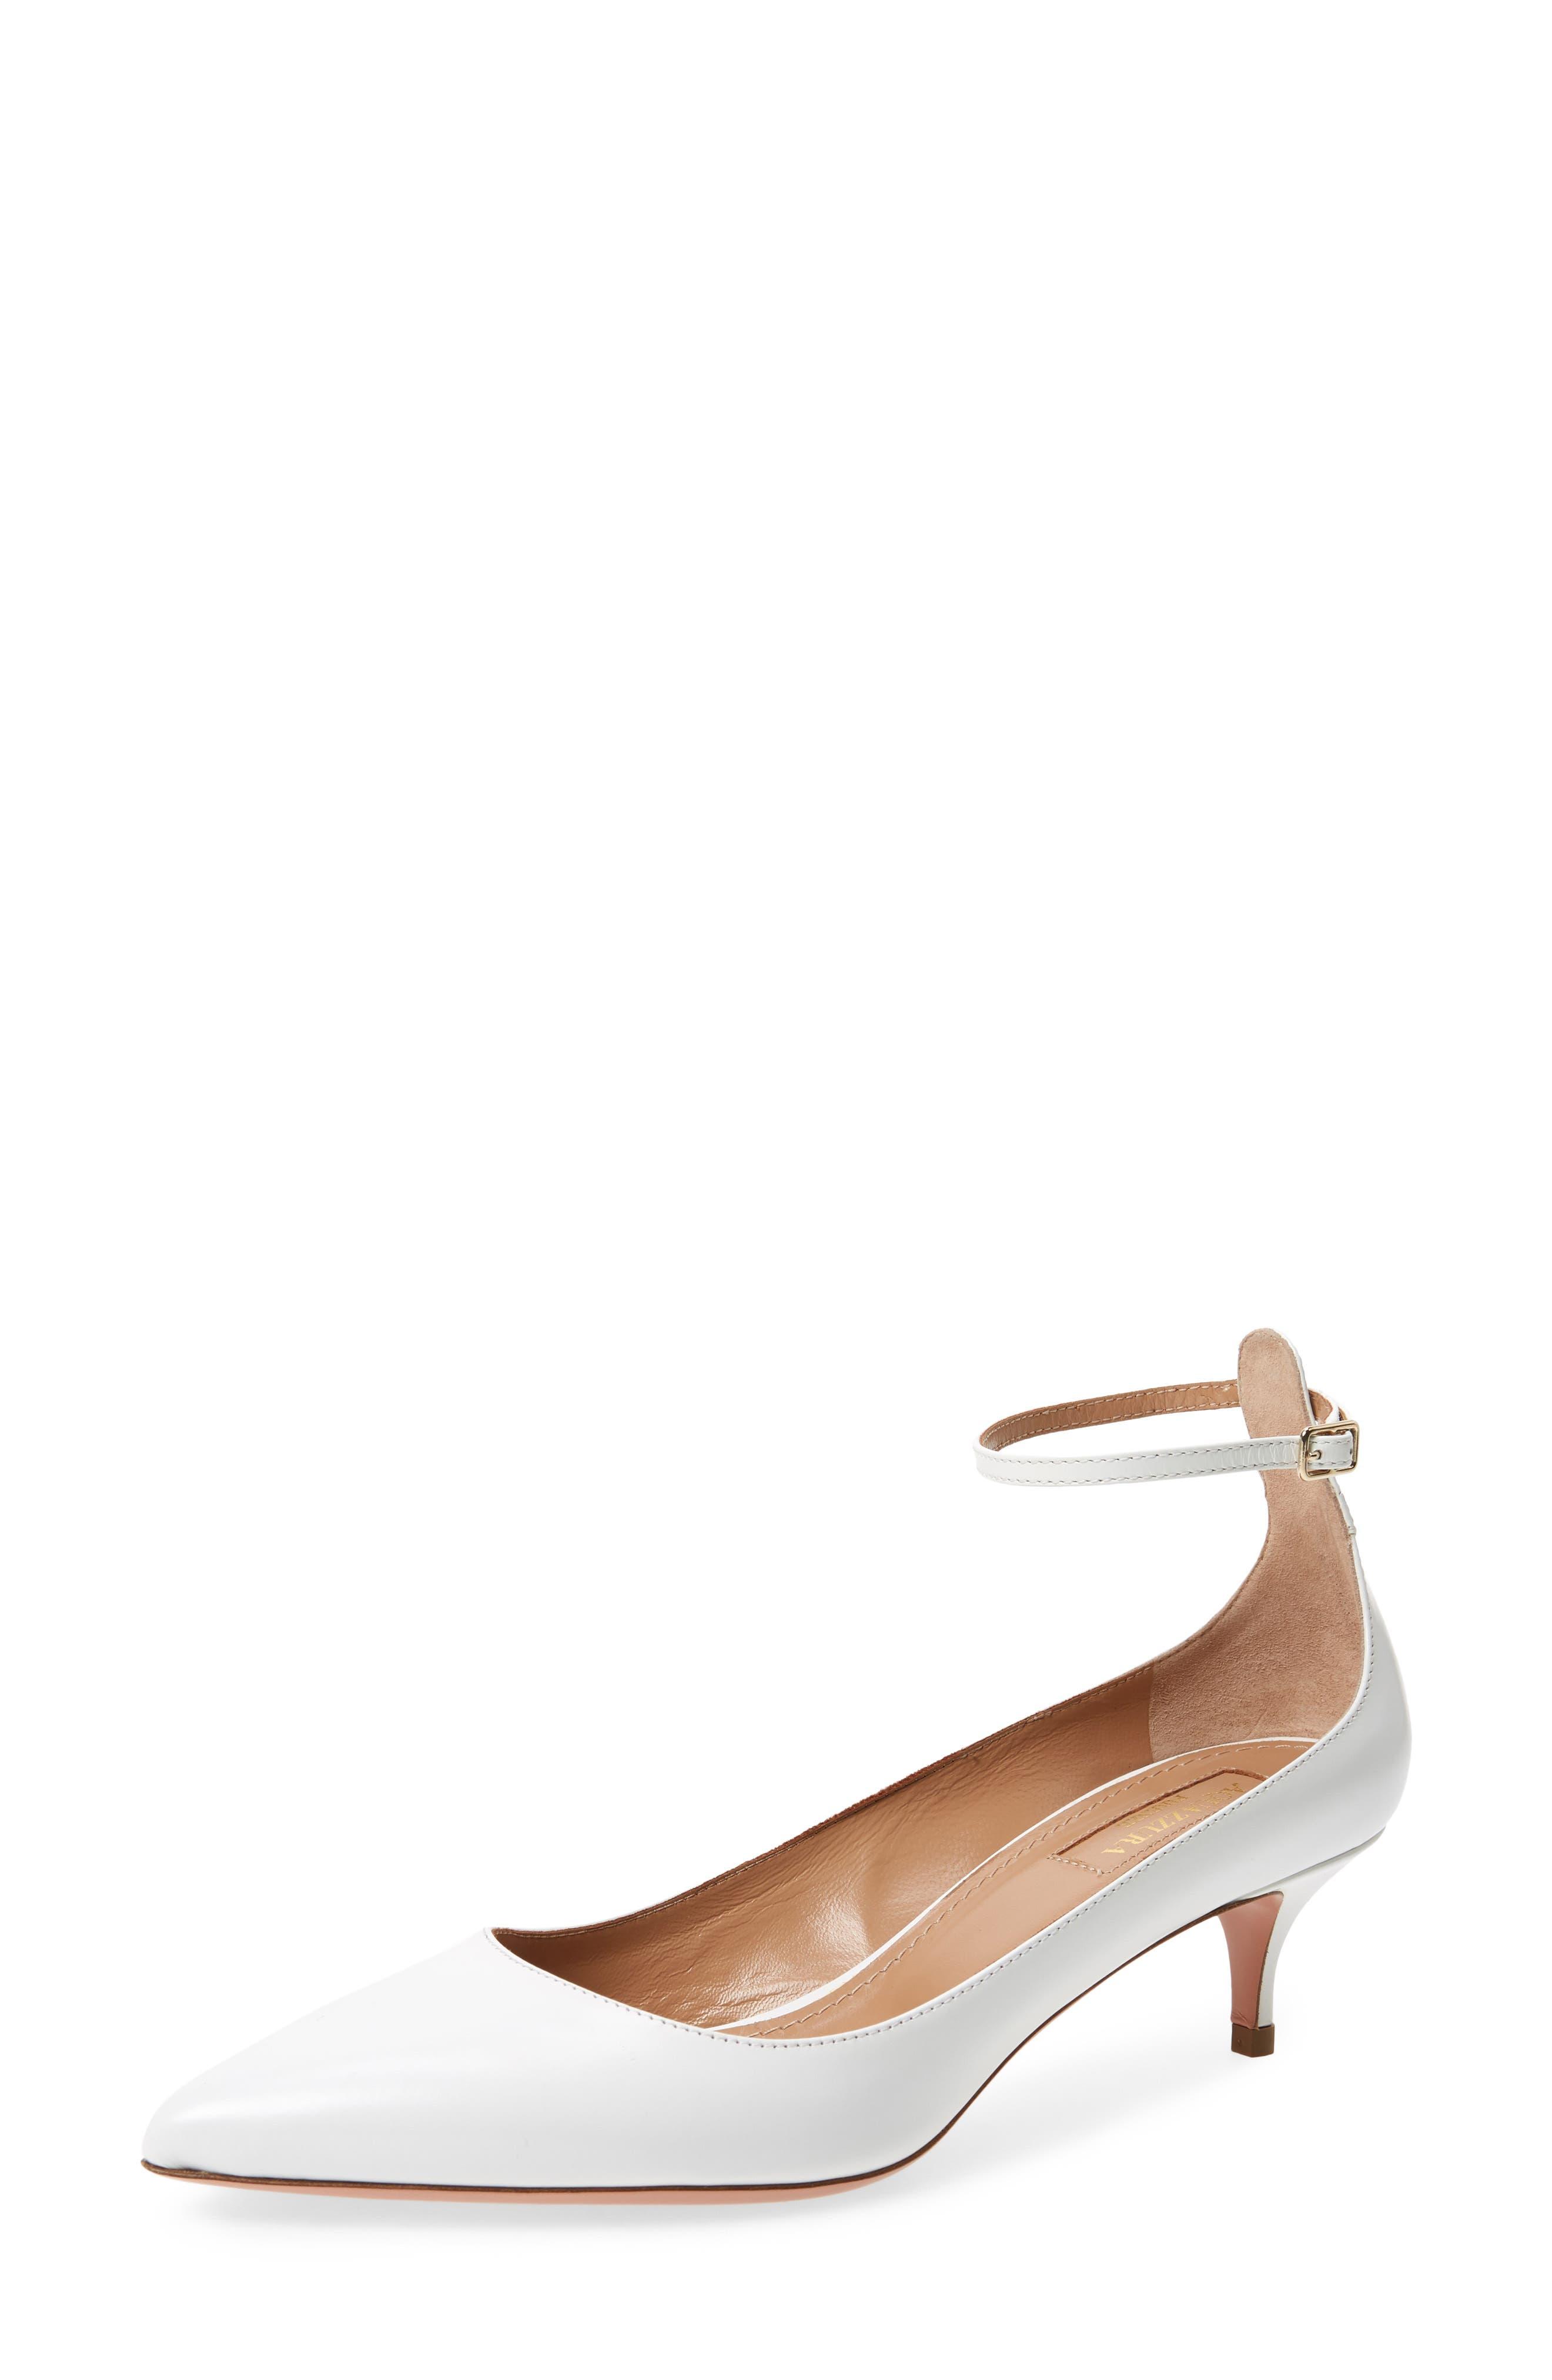 Aquazzura Kisha Ankle Strap Pump (Women)